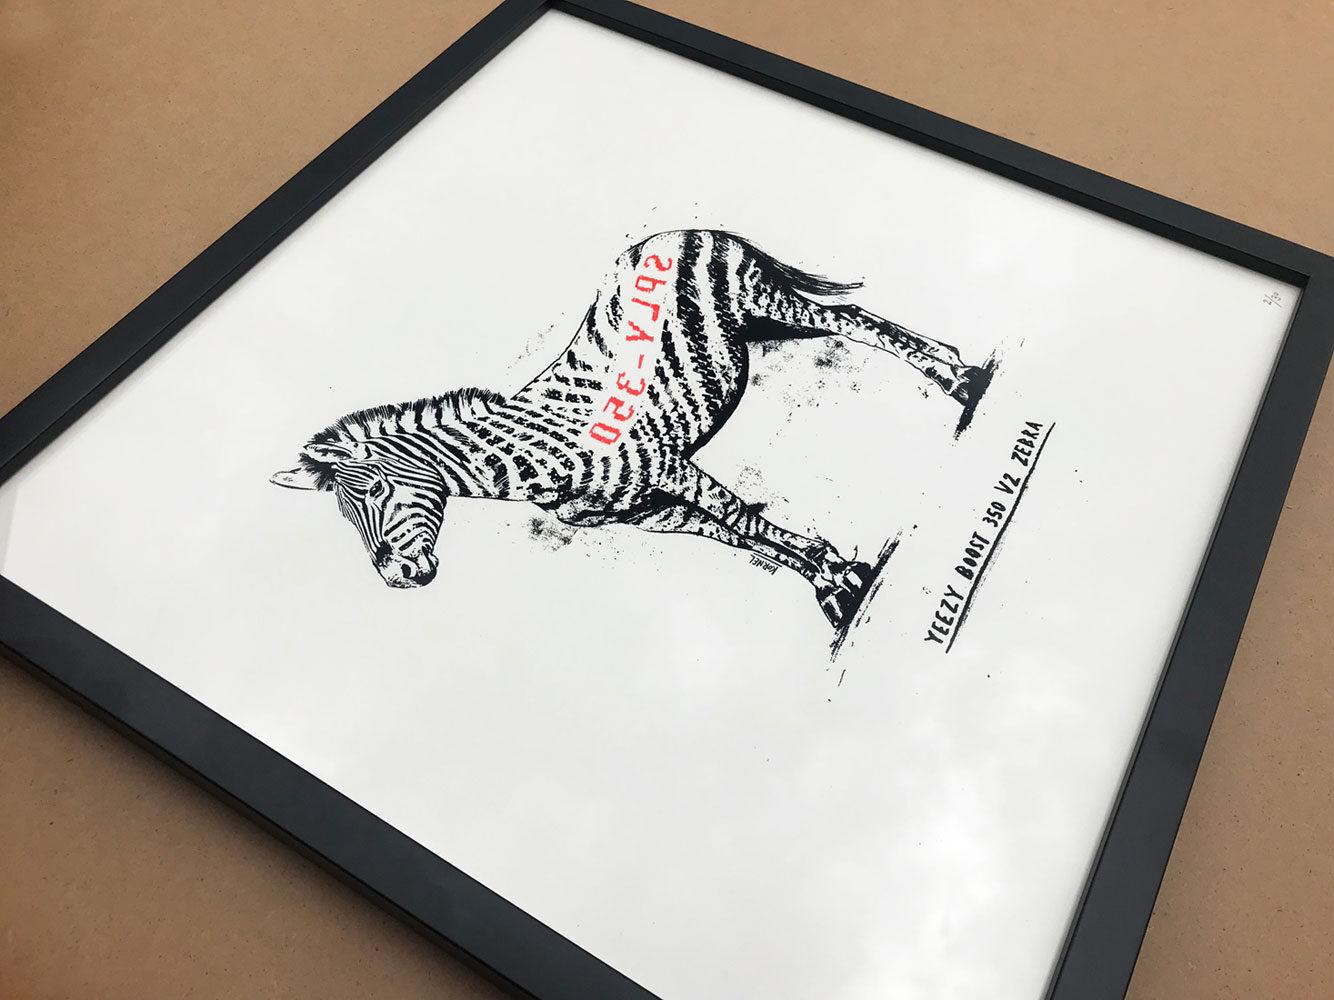 Yeezy 1 - Kornel Illustration | Kornel Stadler portfolio